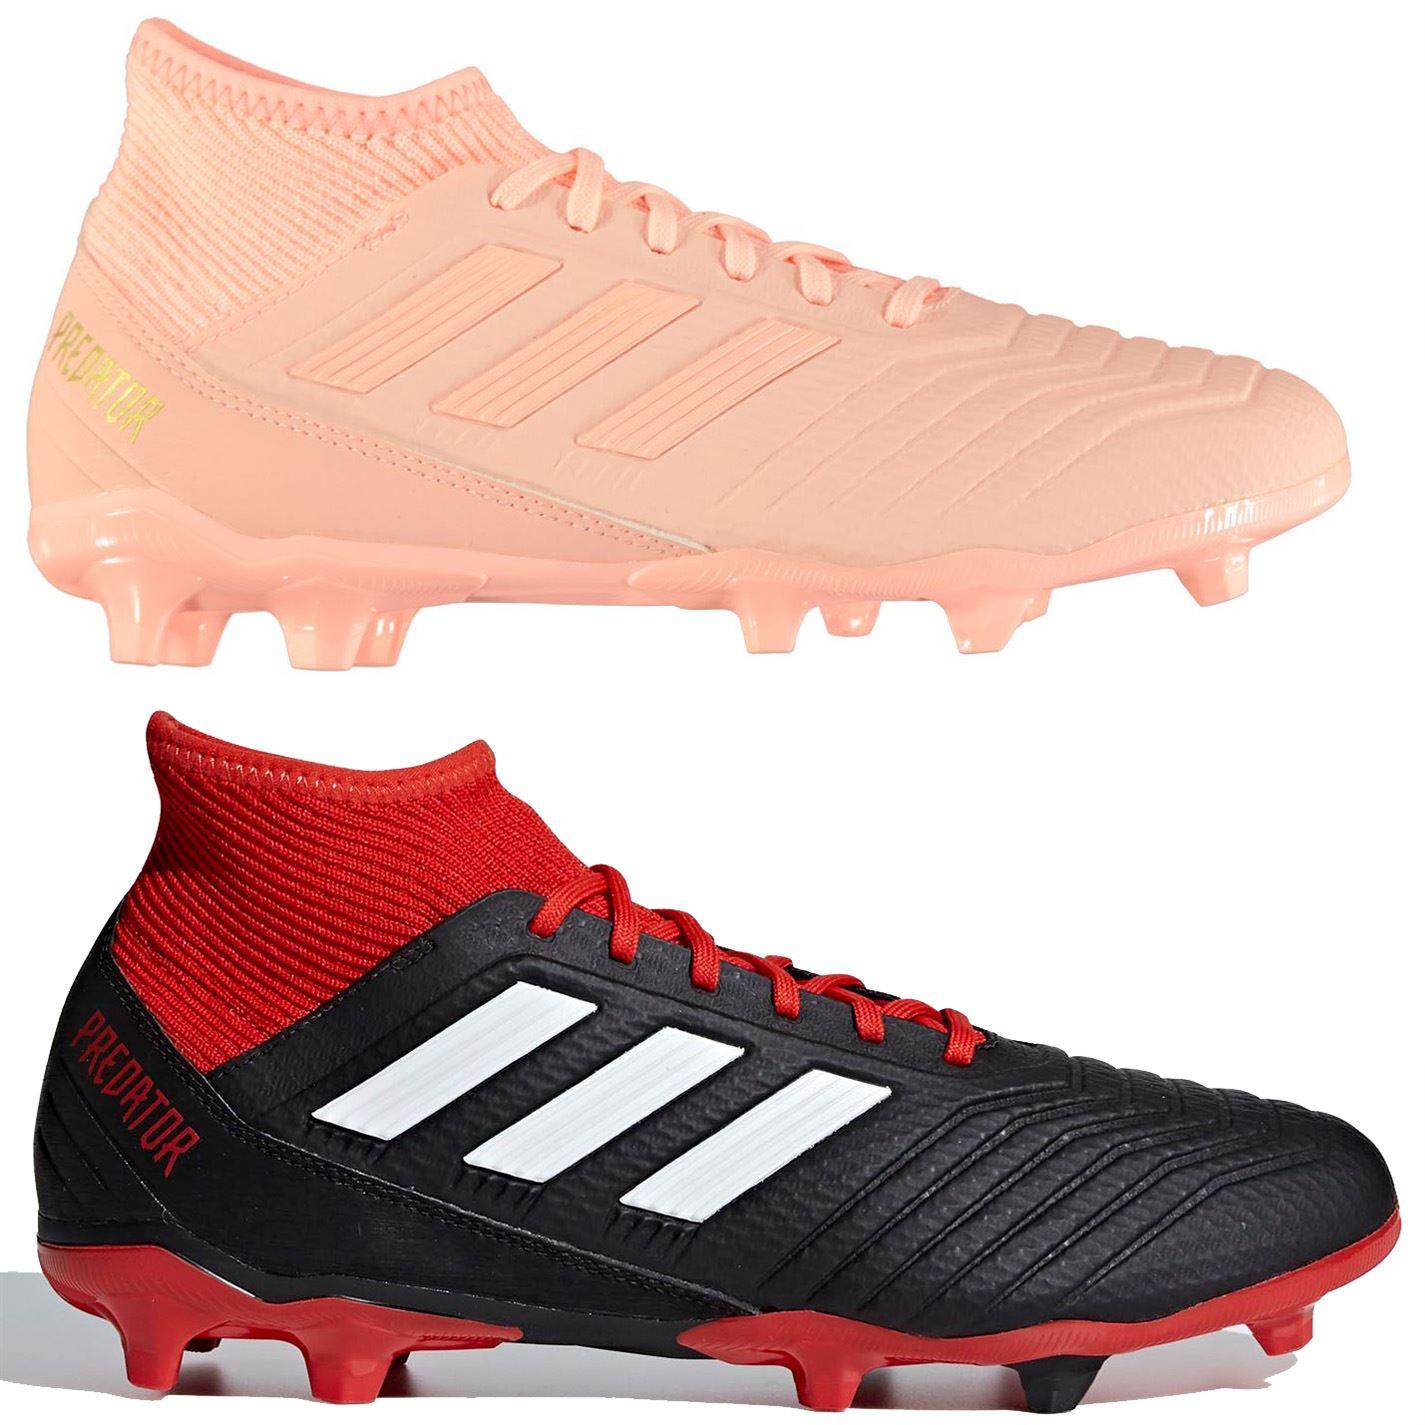 81b068b65 adidas Predator 18.3 FG Firm Ground Football Boots Mens Soccer Shoes Cleats